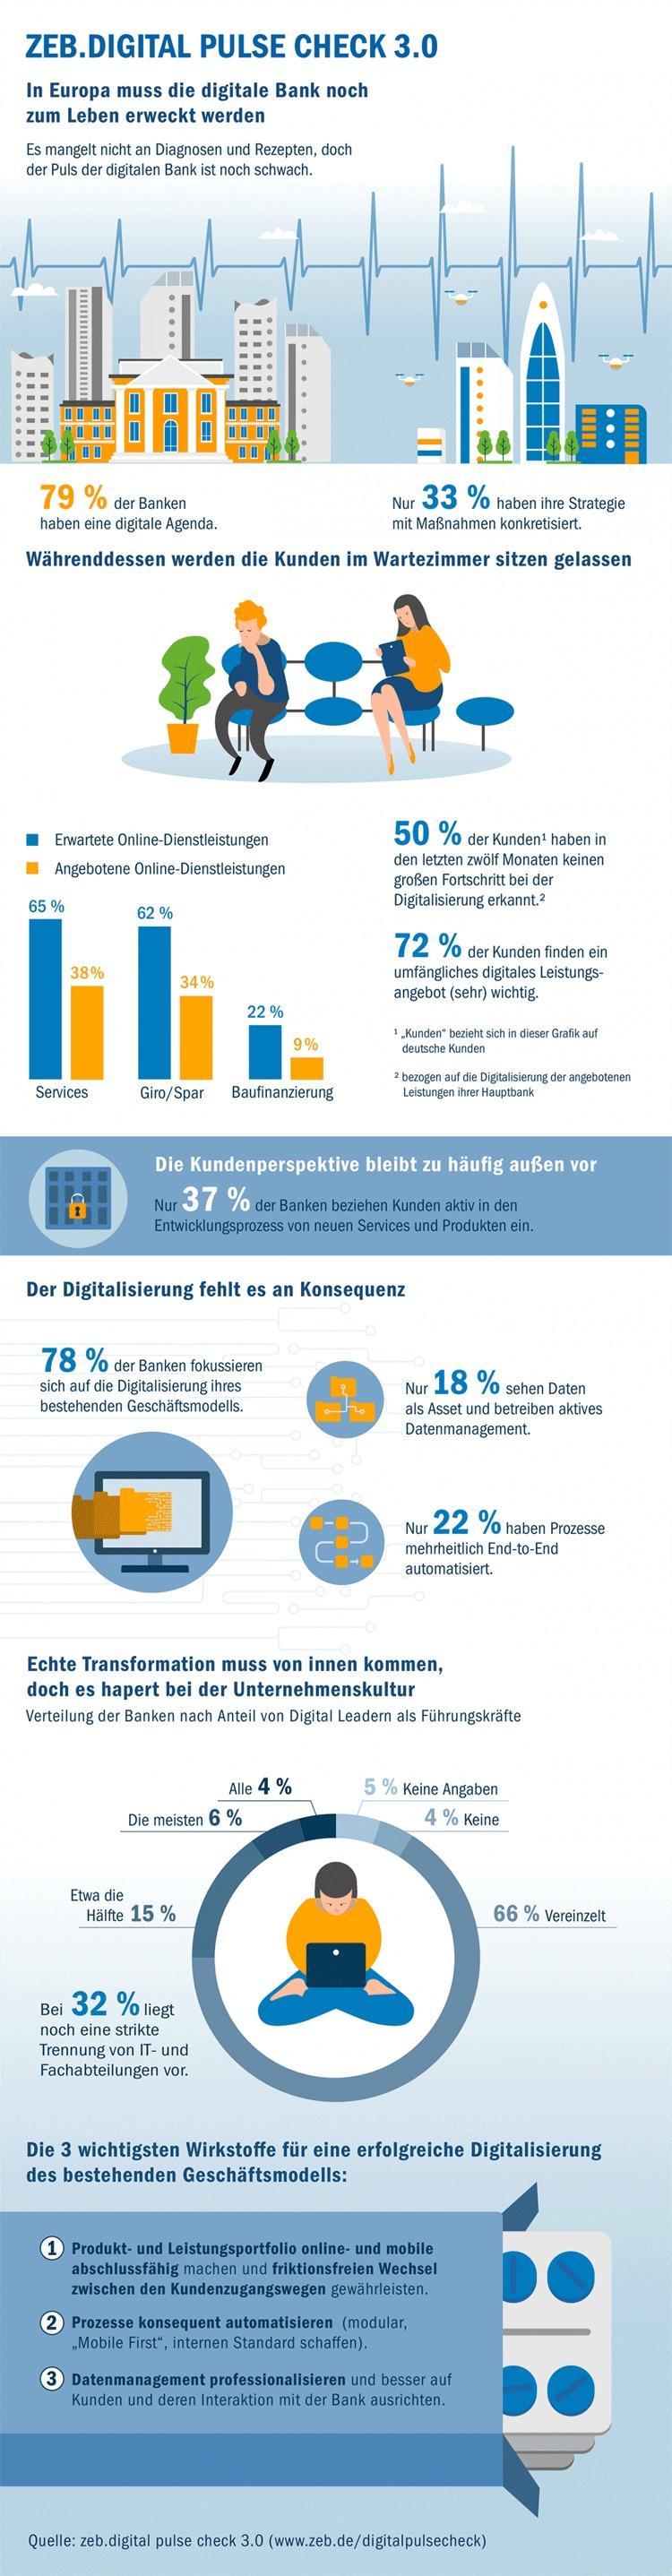 Infografik: Status des digitalen Bankings